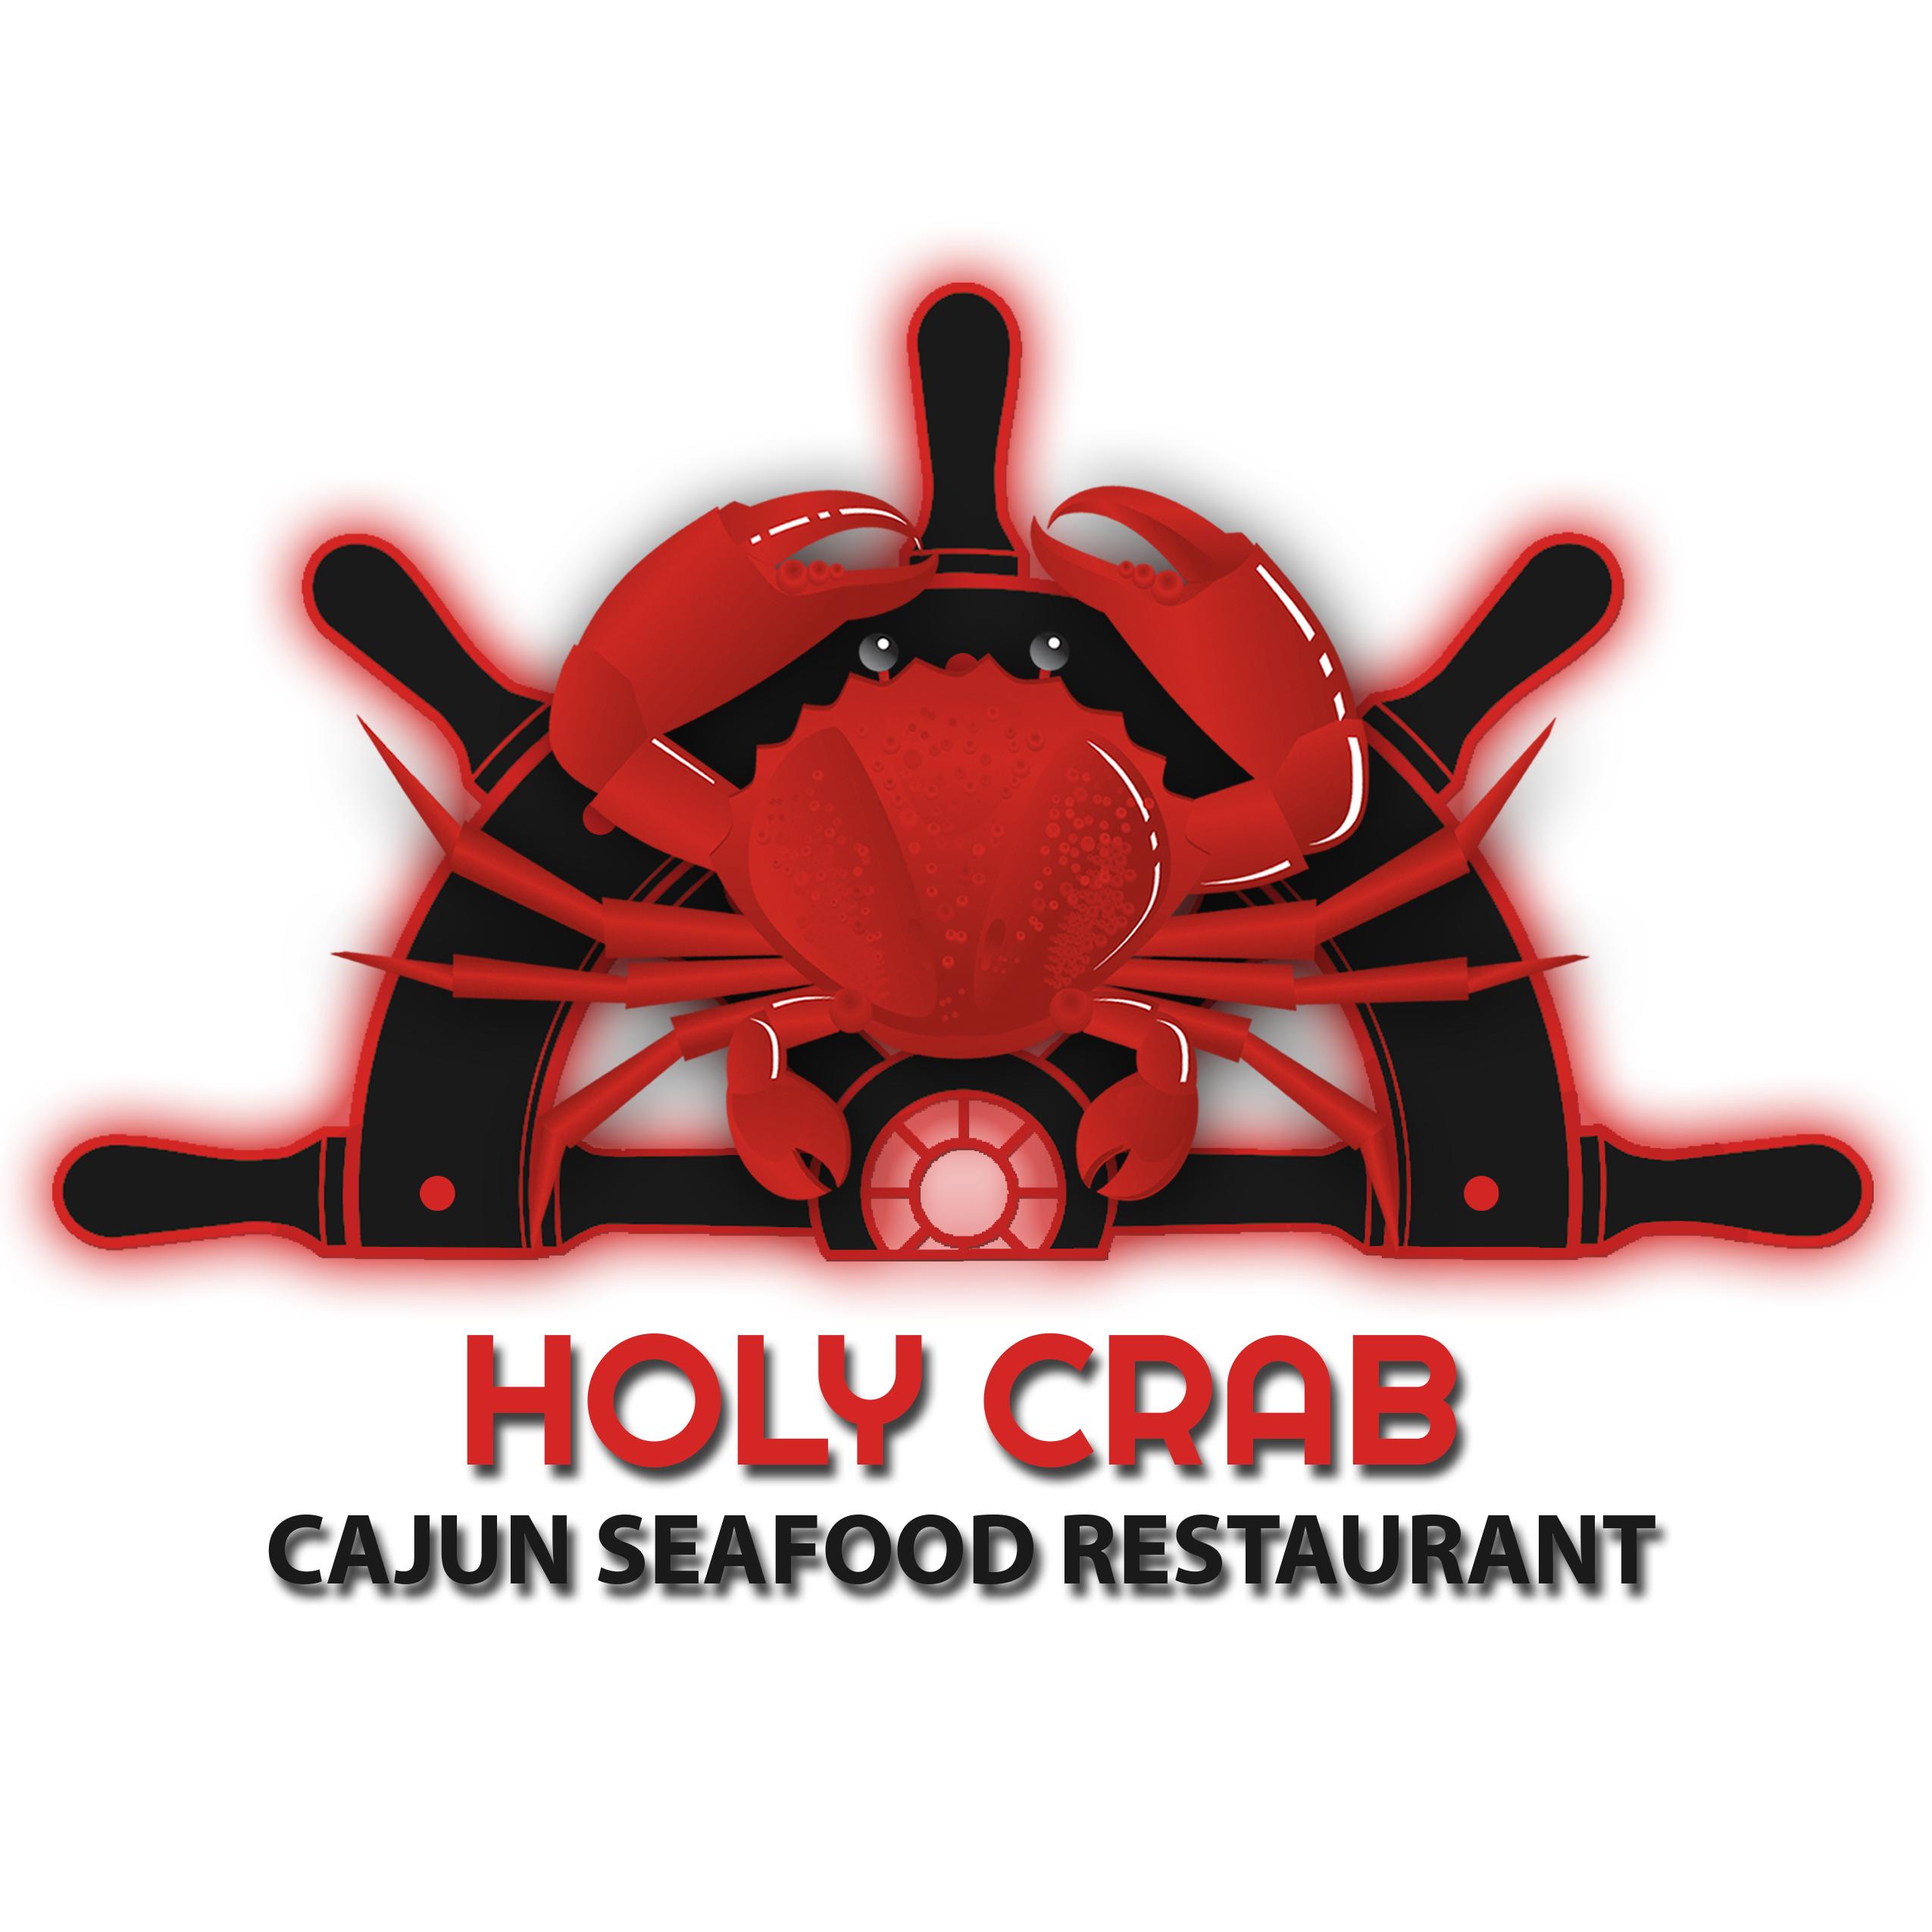 Holy Crab Cajun Seafood Restaurant 手抓海鮮